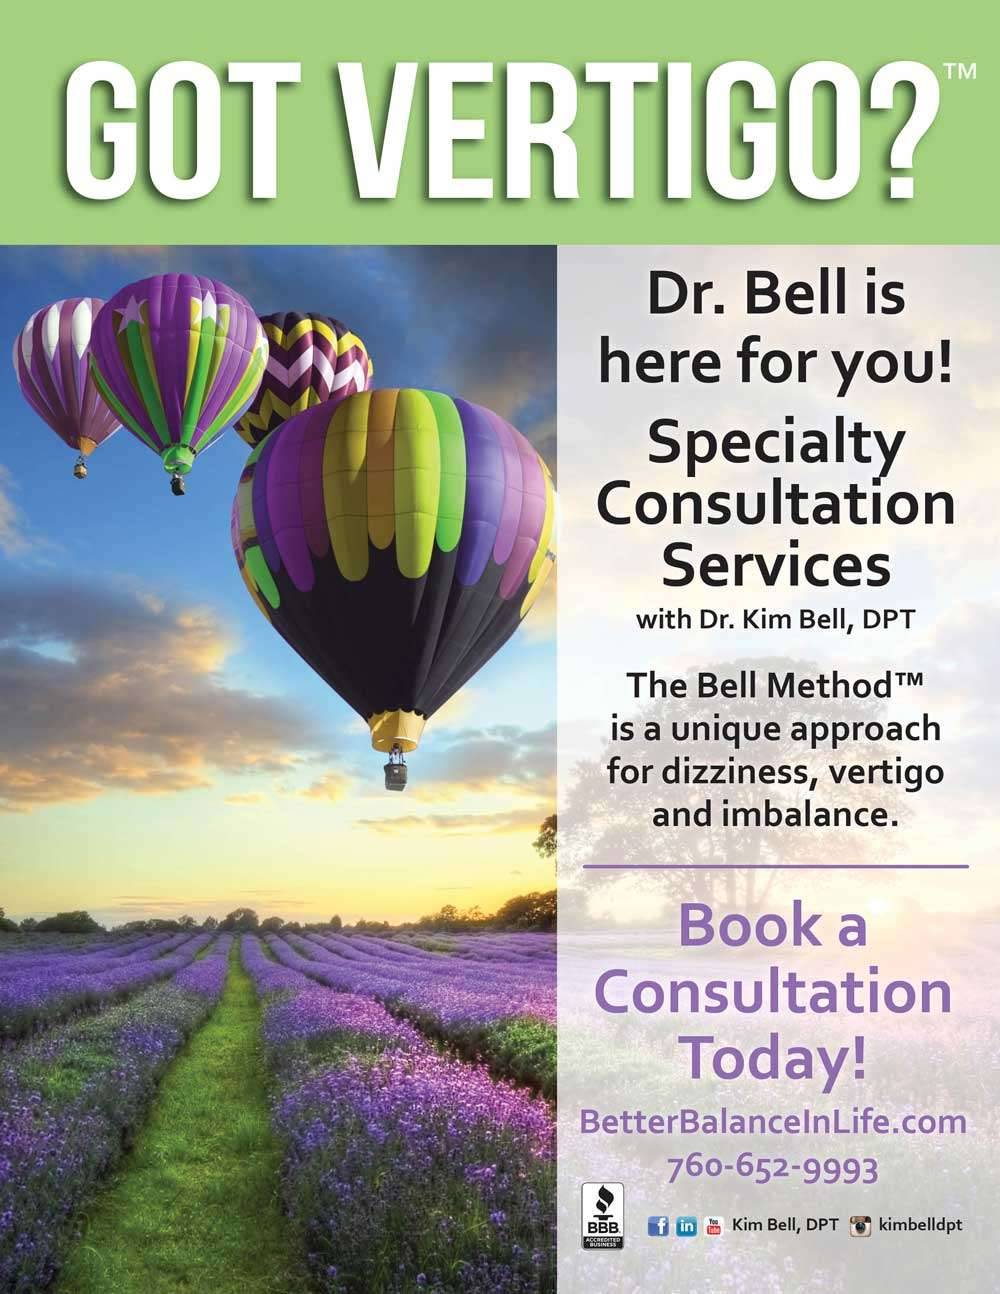 Book Appointment With Kim Bell, DPT - San Diego Vertigo Expert